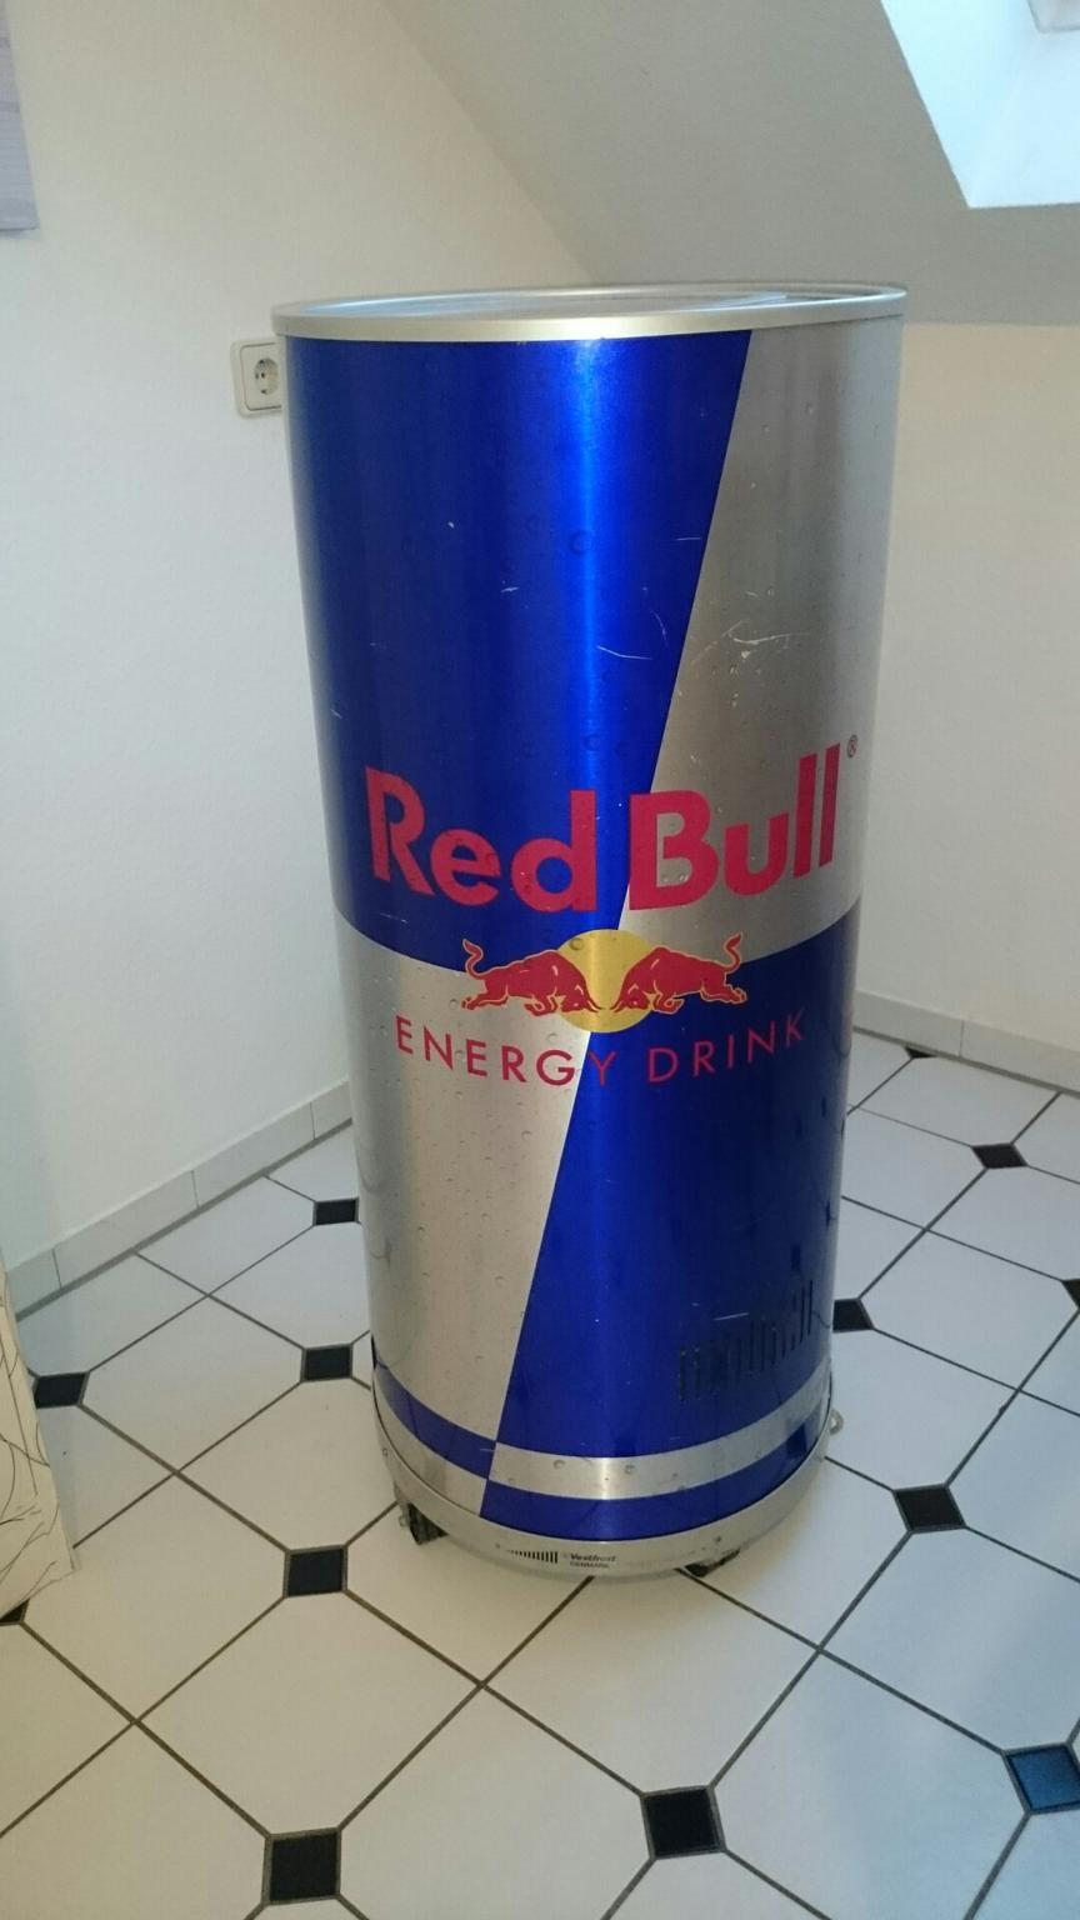 Red Bull Kühlschrank Verkaufen : Gebraucht redbull kühlschrank in köln um u ac u shpock